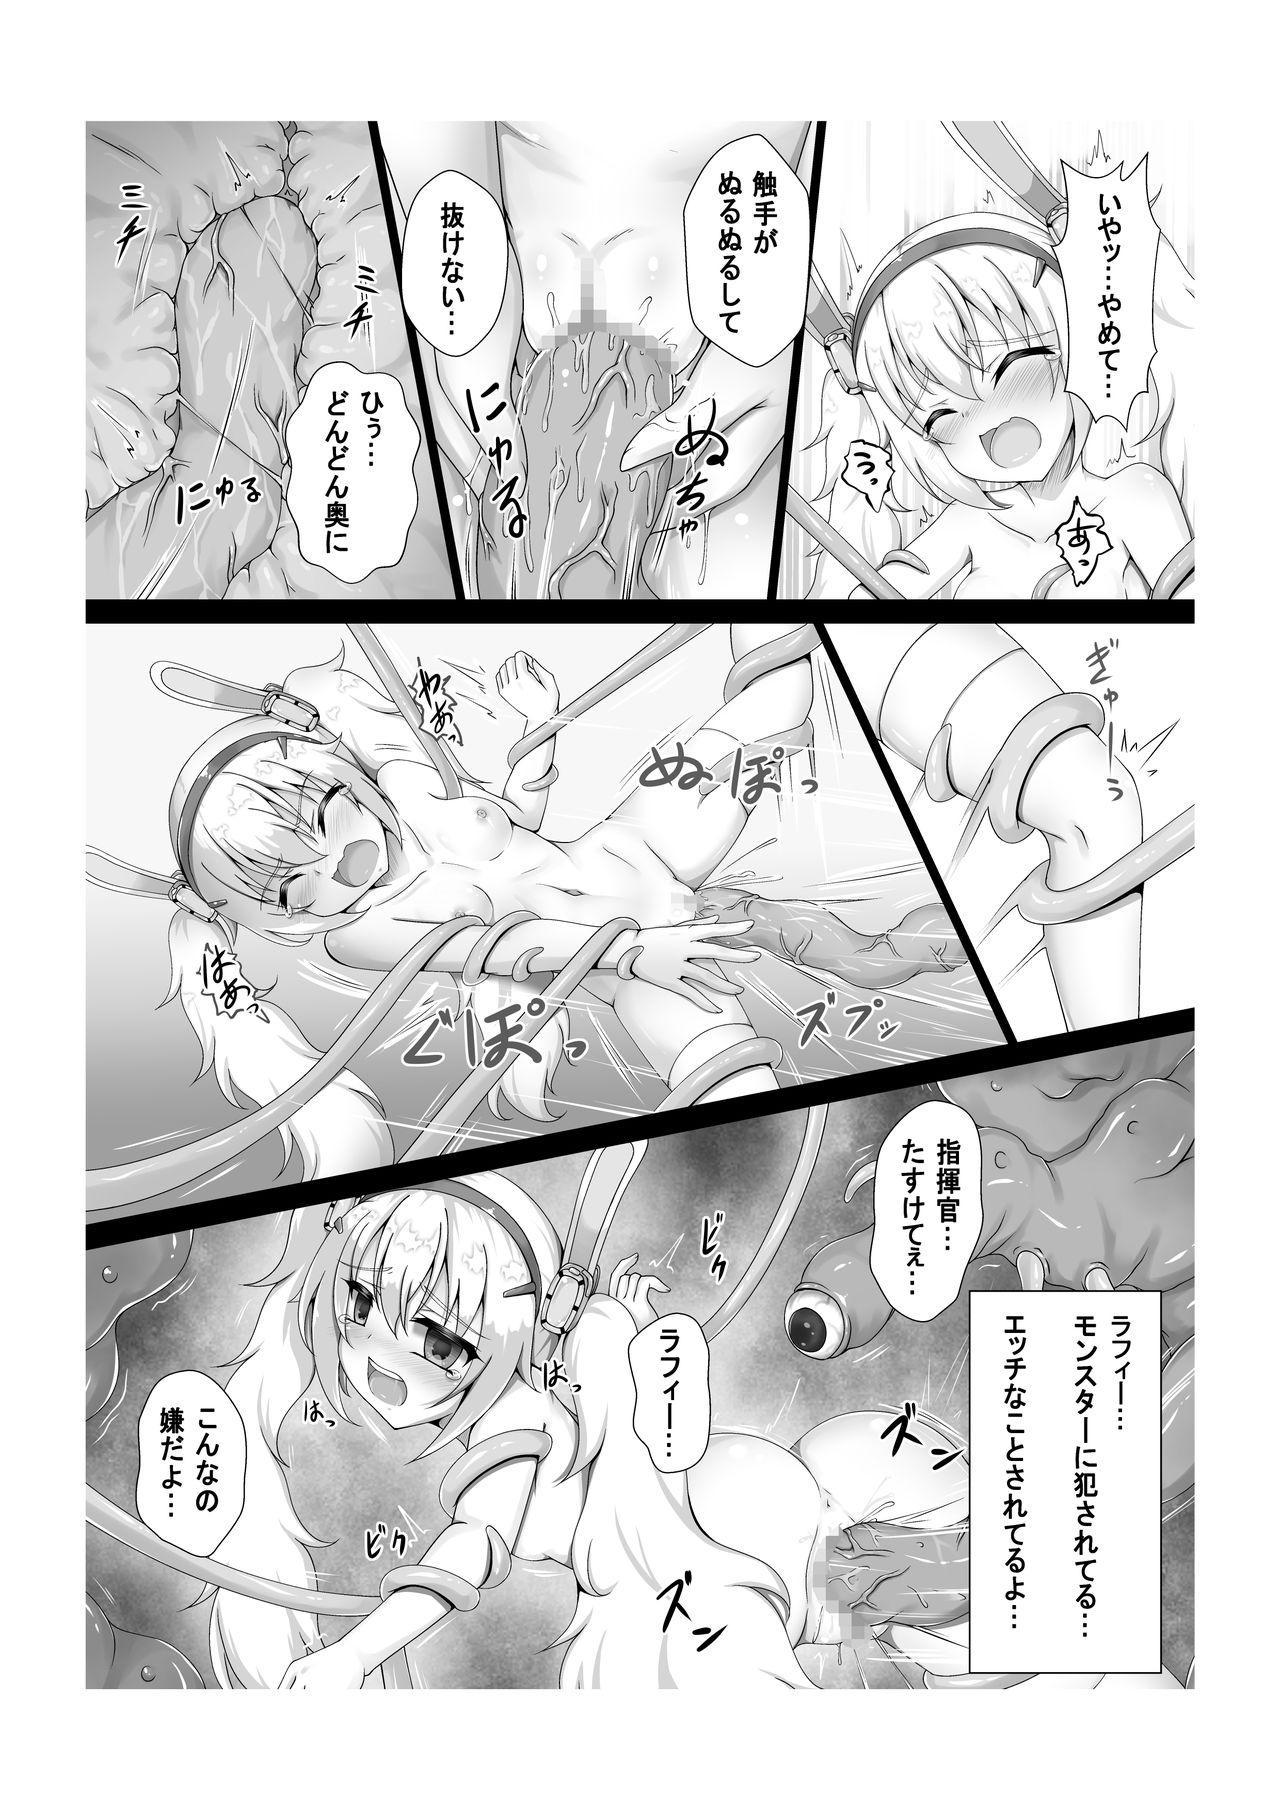 Monster Box Laffey + Omake CG 20